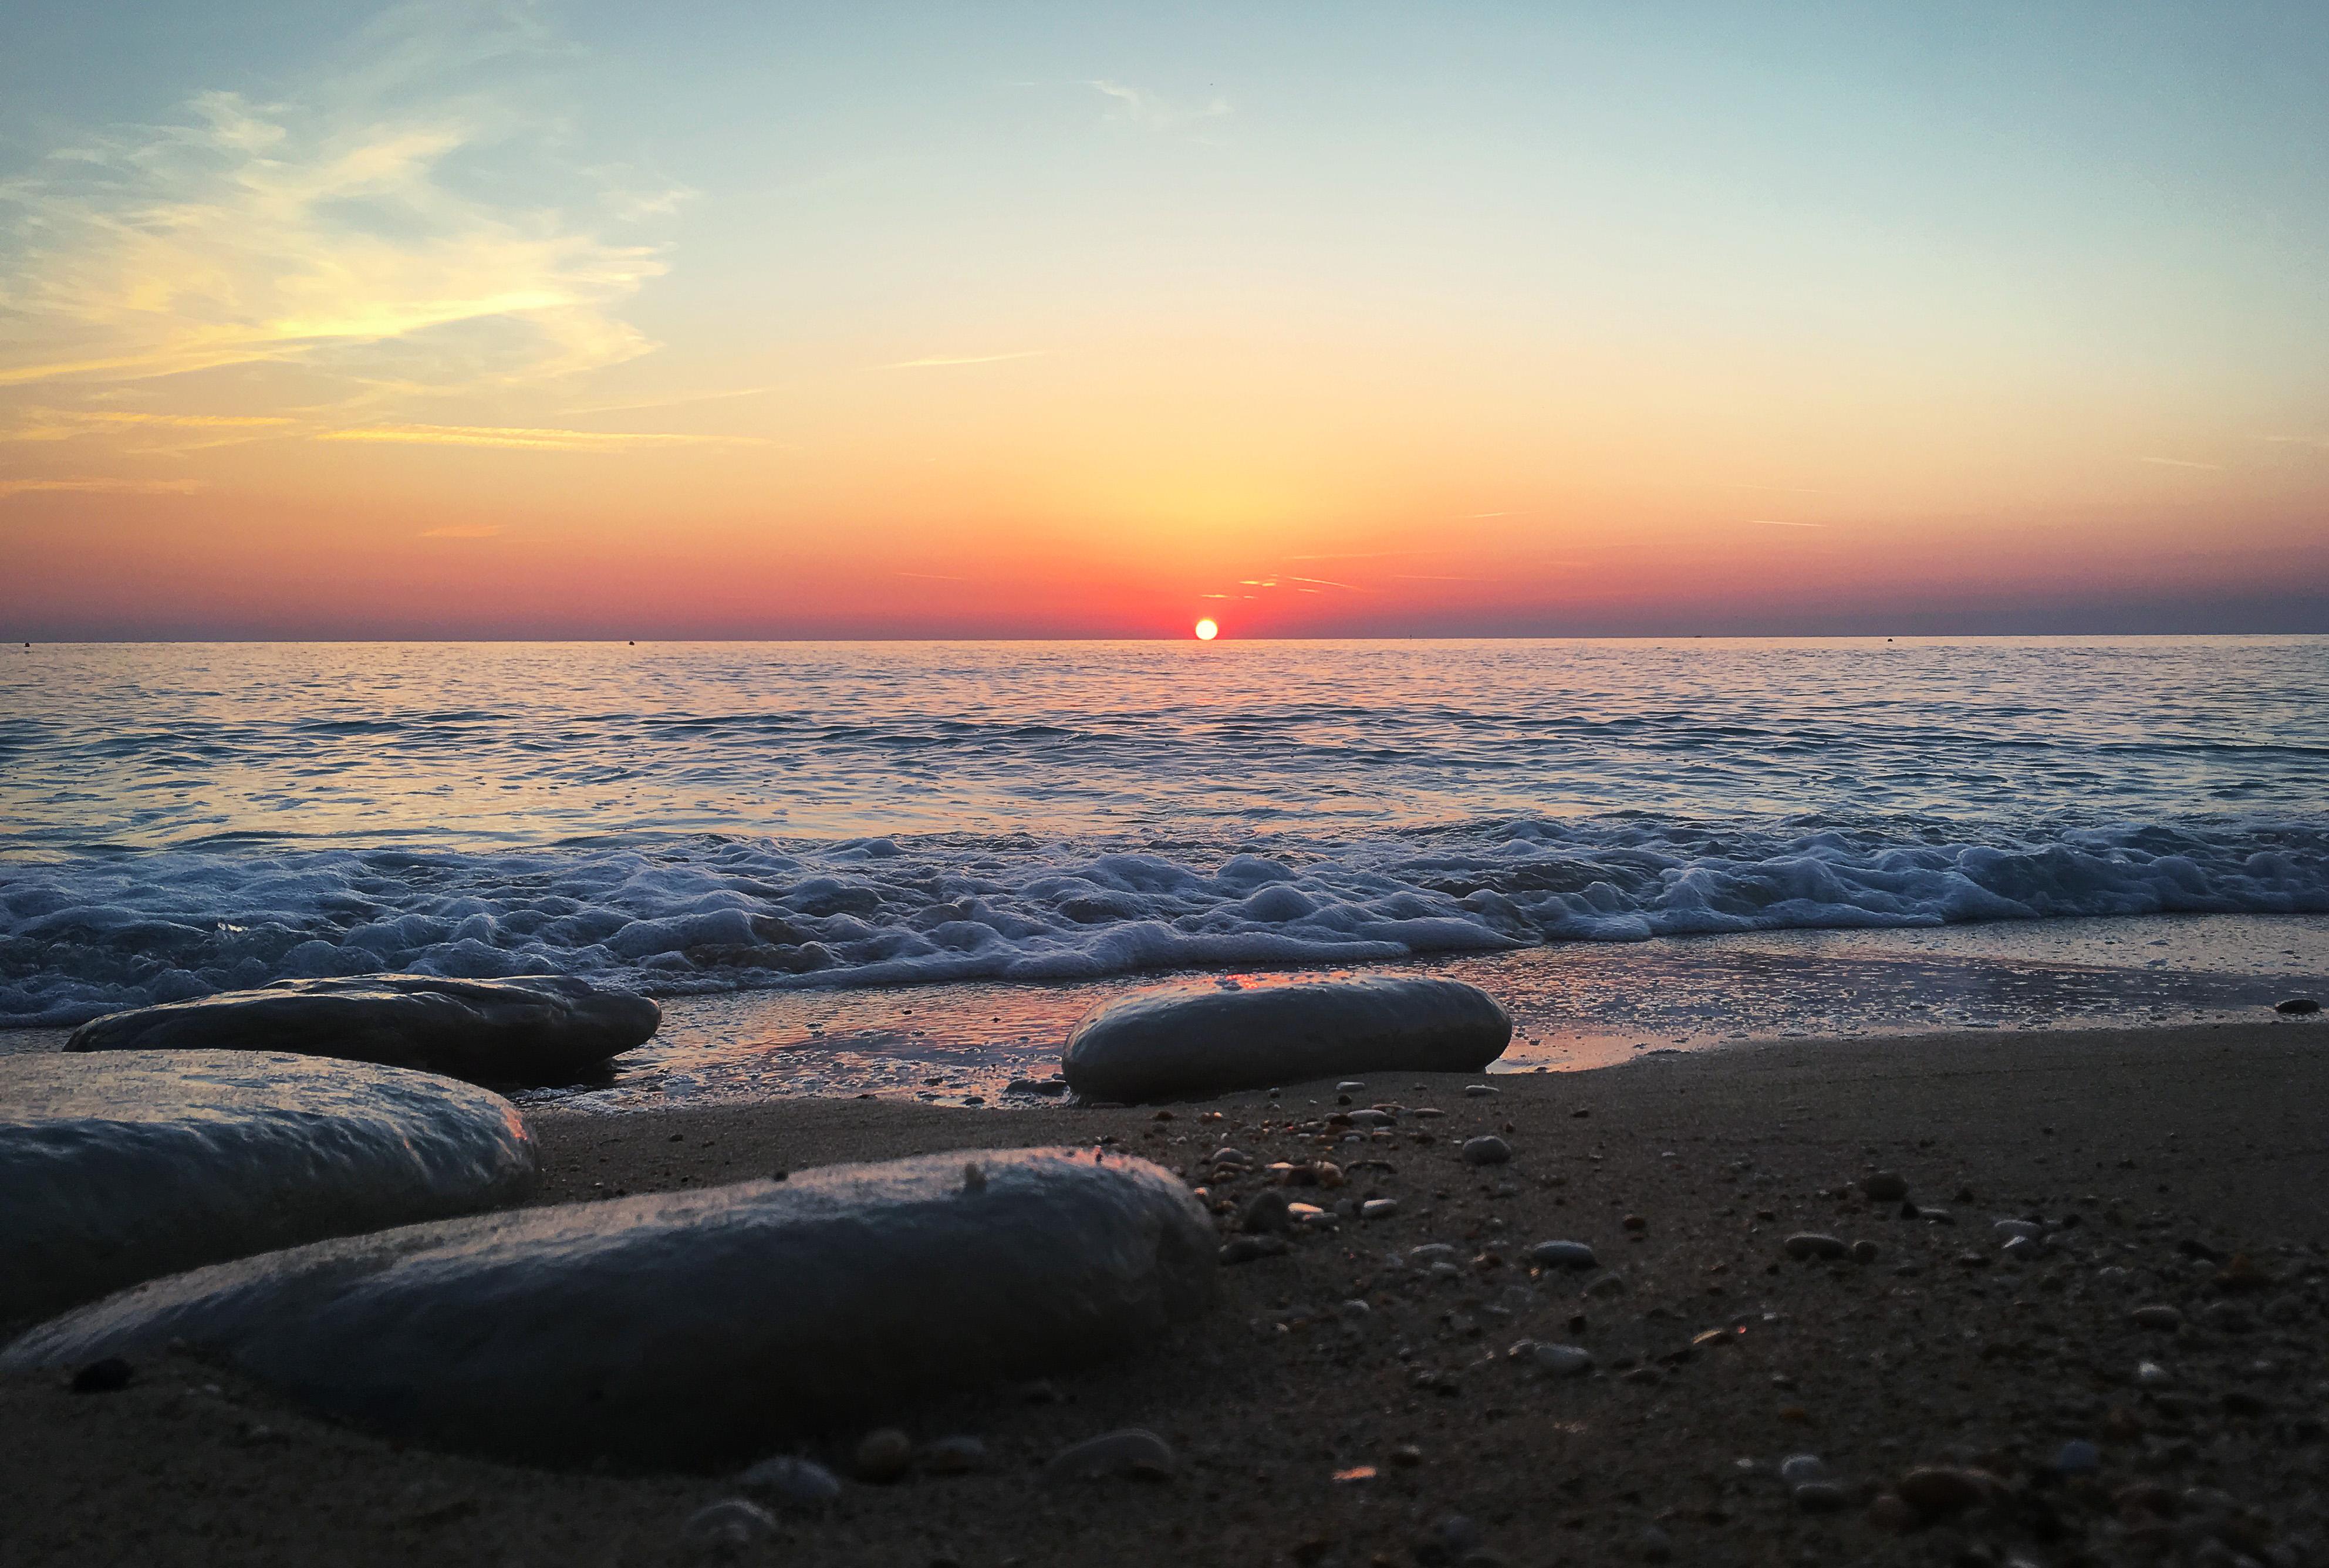 Beautiful Sunrise over the Adriatic Sea , Sirolo, #Italy, Adriatic, Ocean, Water, View, HQ Photo